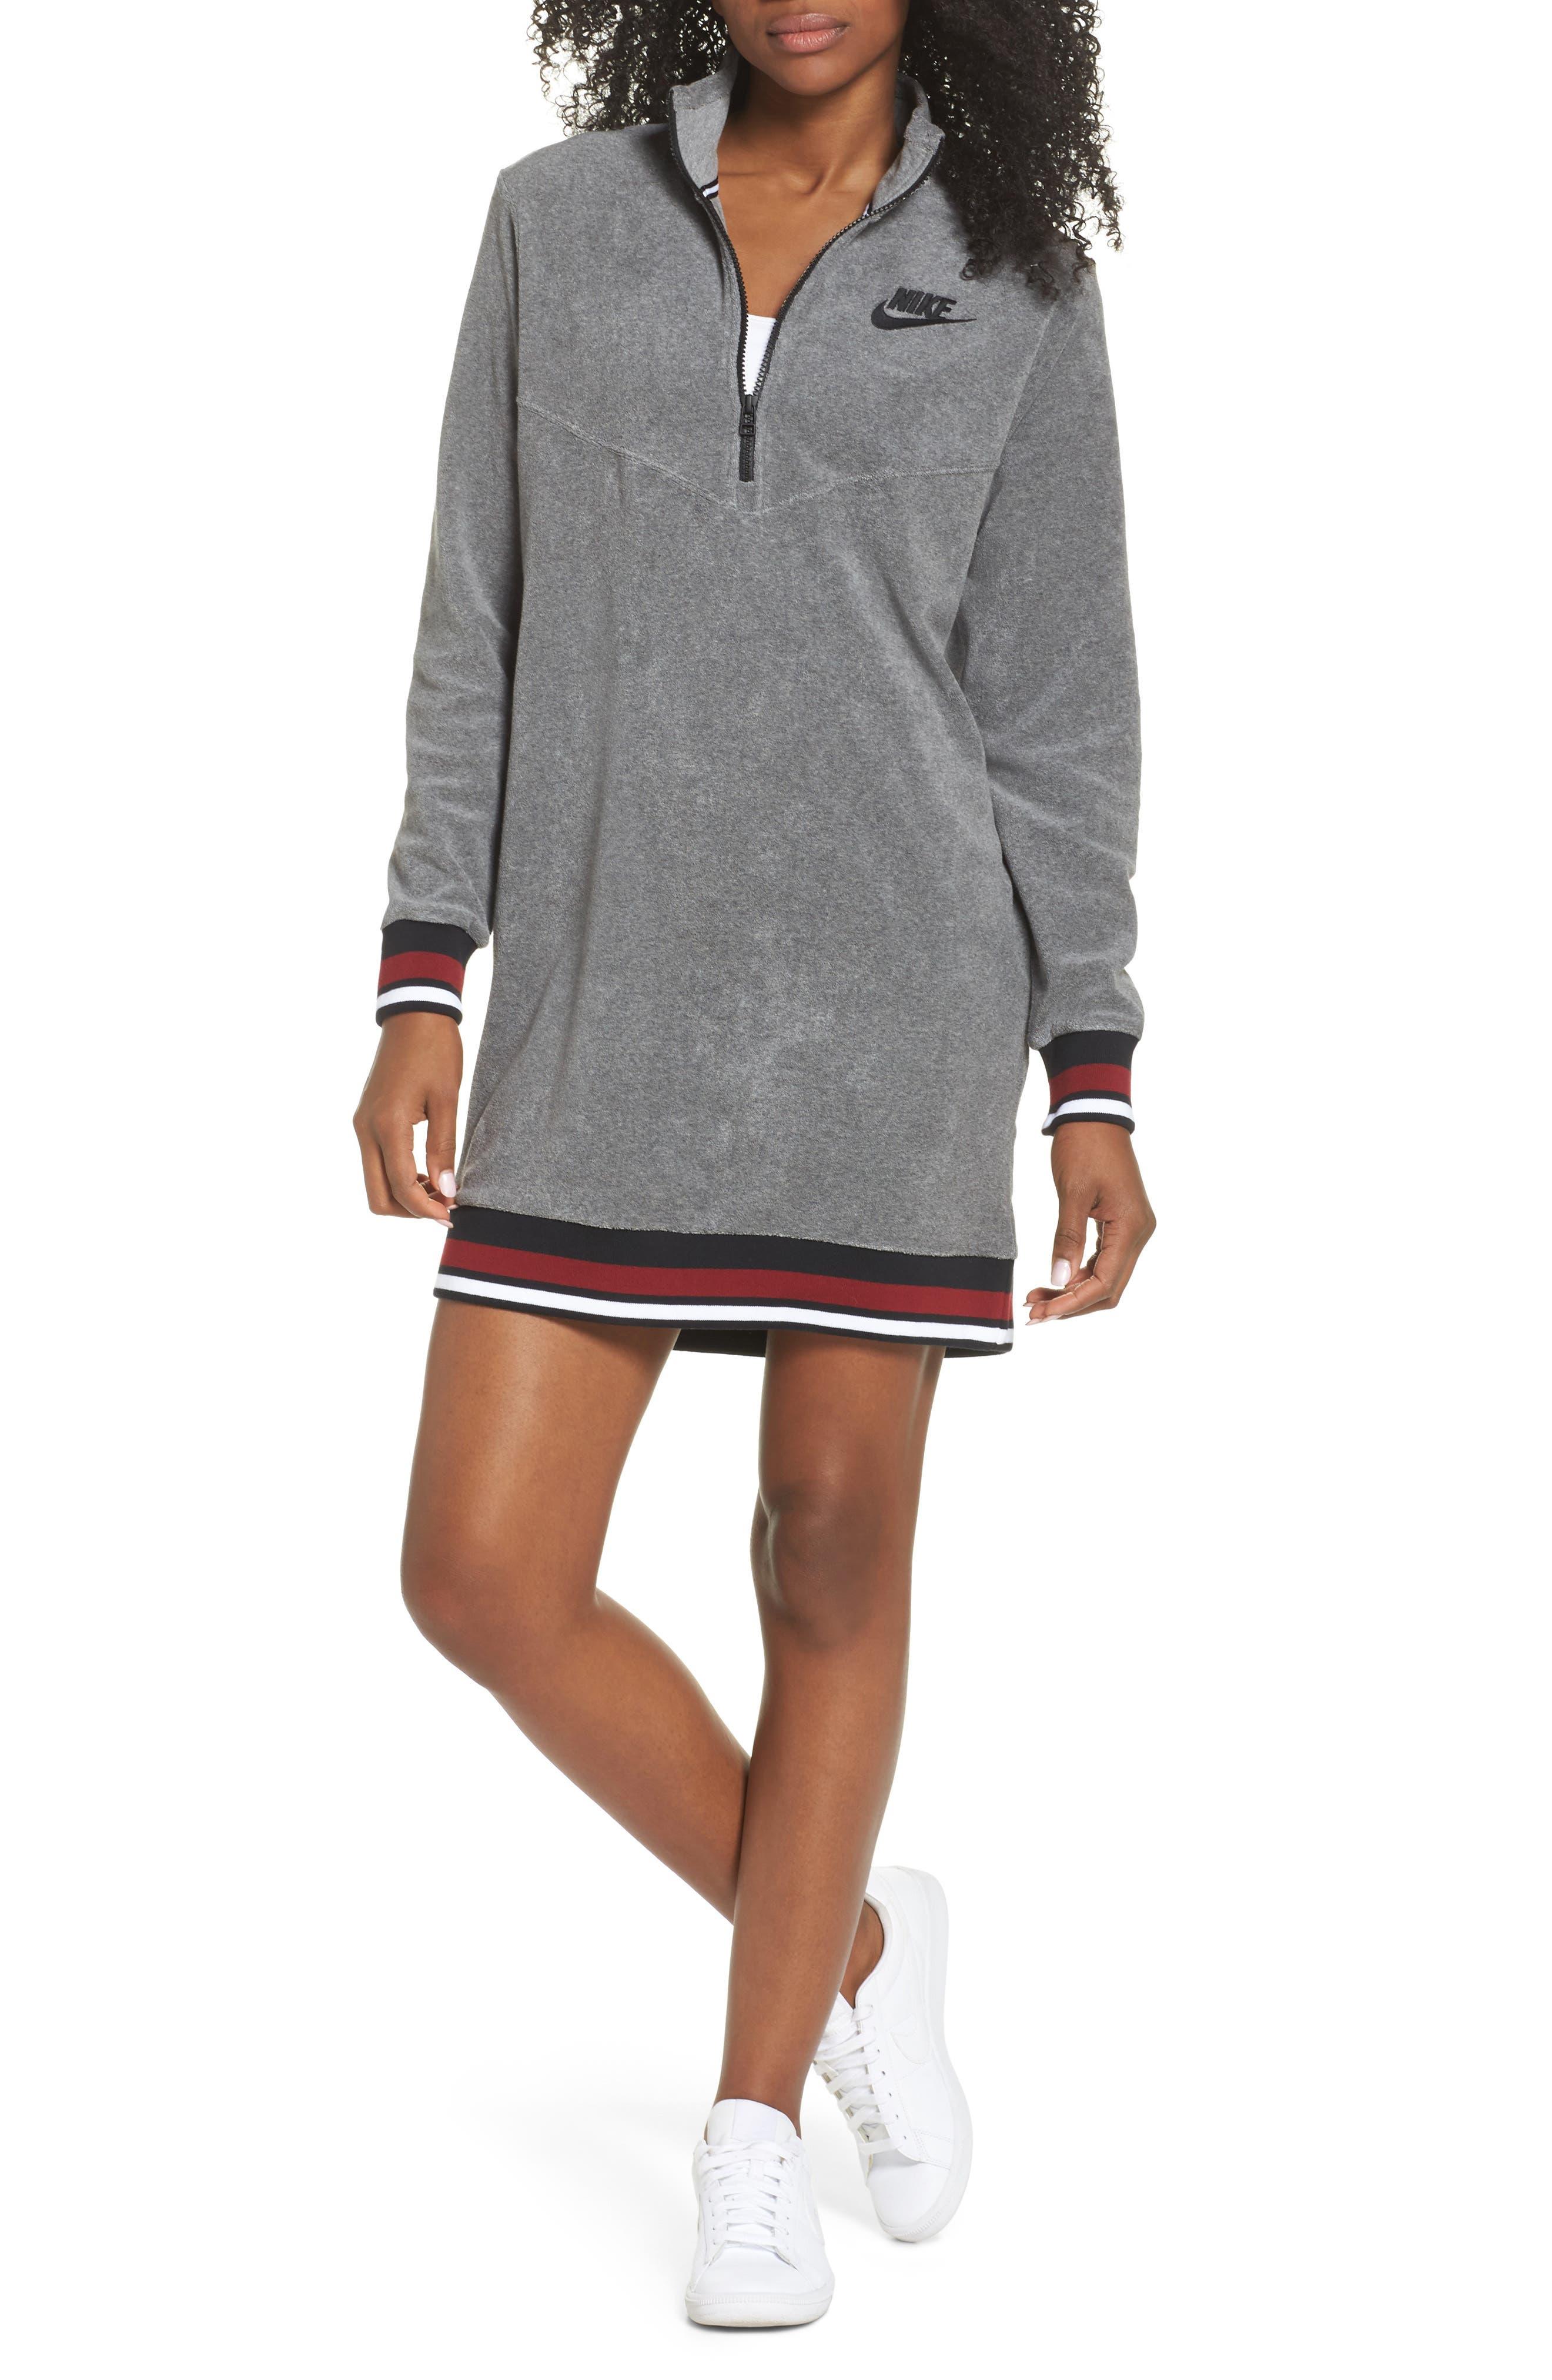 Sportswear French Terry Sweatshirt Dress,                             Main thumbnail 1, color,                             020